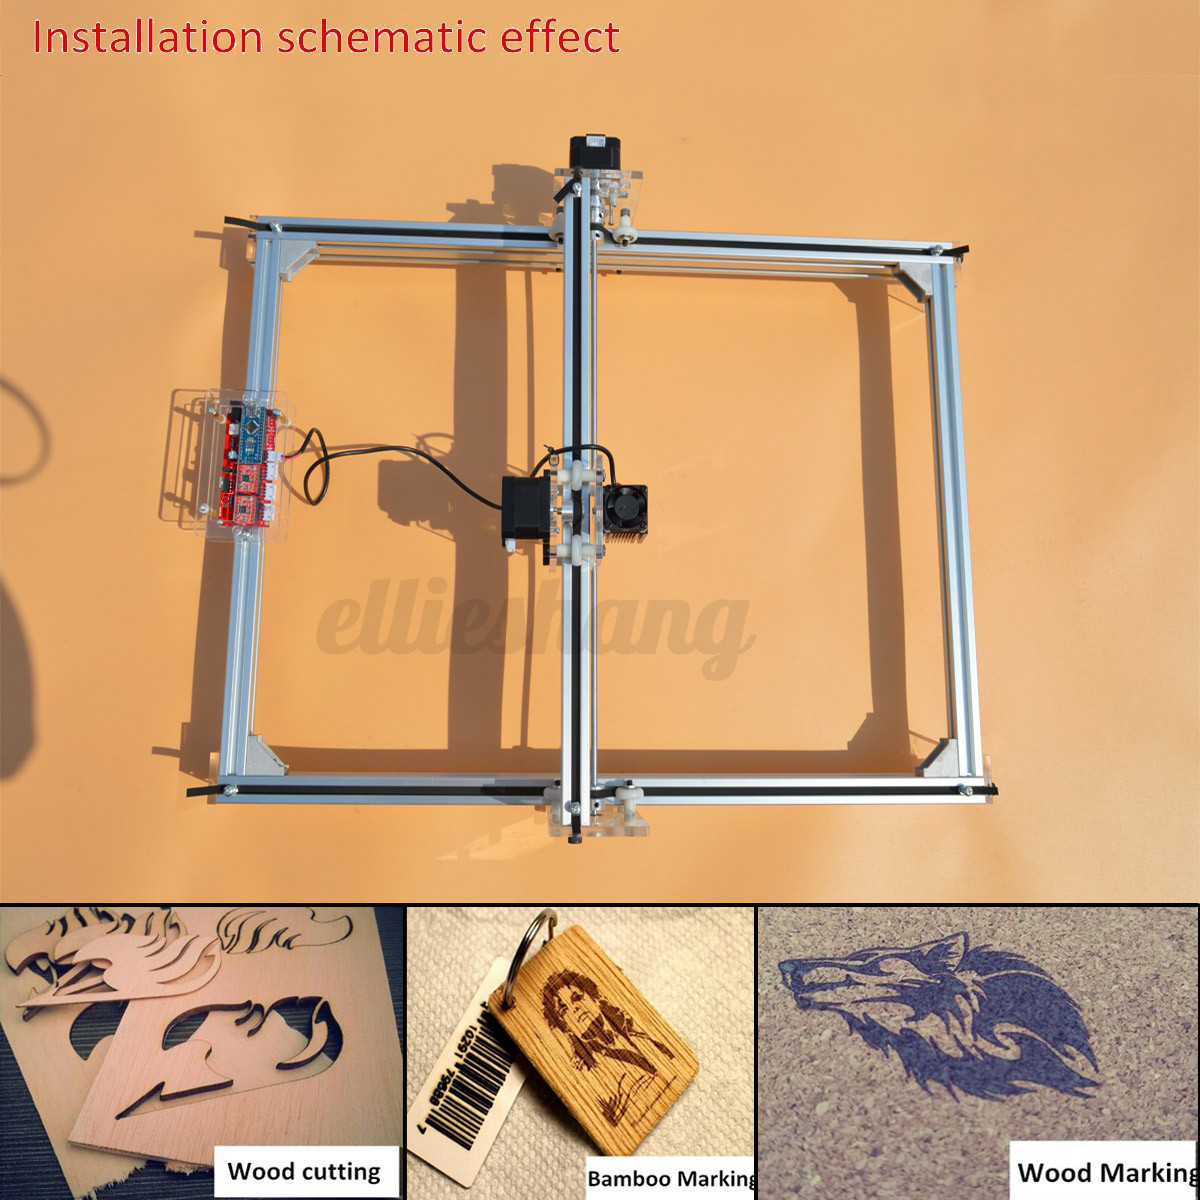 500mw mini laser engraving machine logo cutting marking wood printer 40x50cm diy ebay. Black Bedroom Furniture Sets. Home Design Ideas